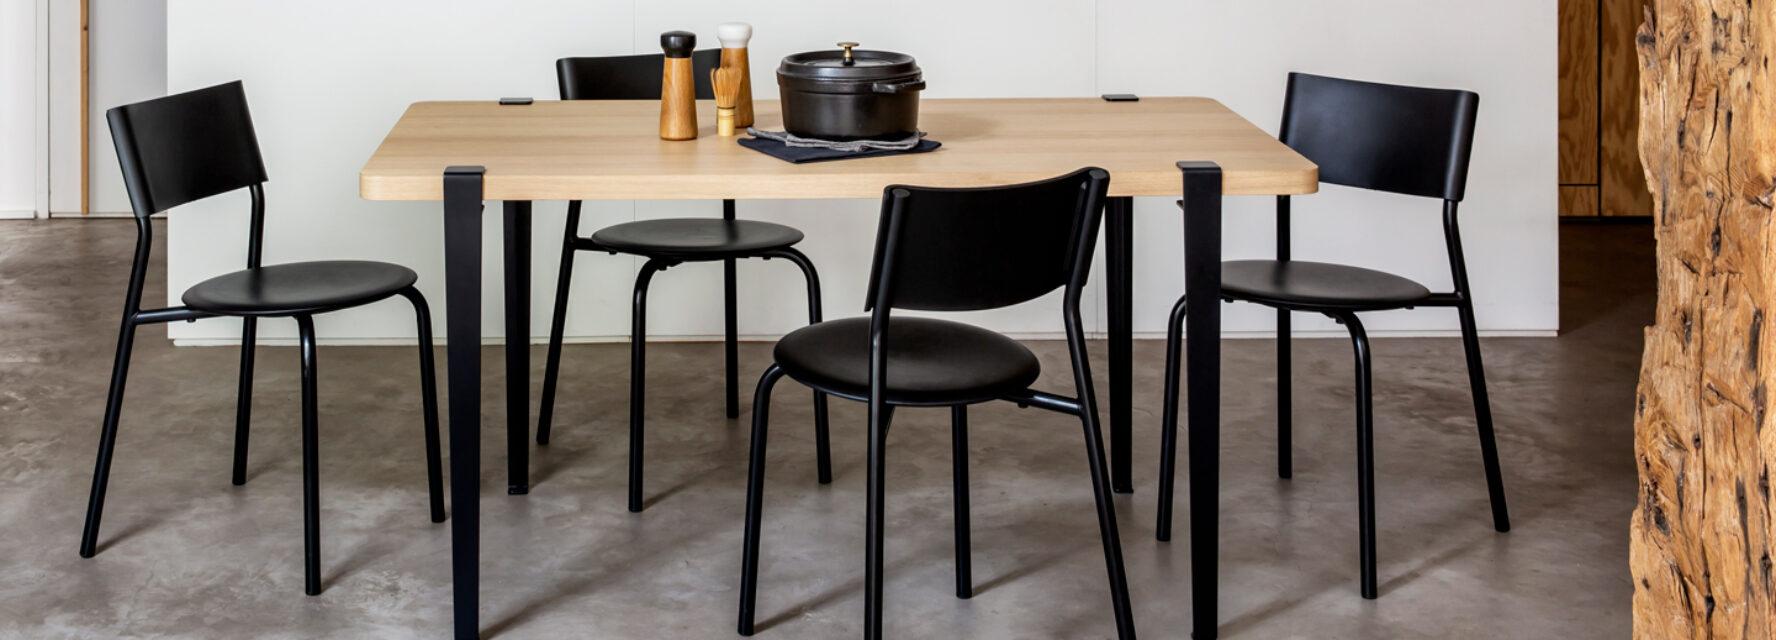 Dining tables - TIPTOE